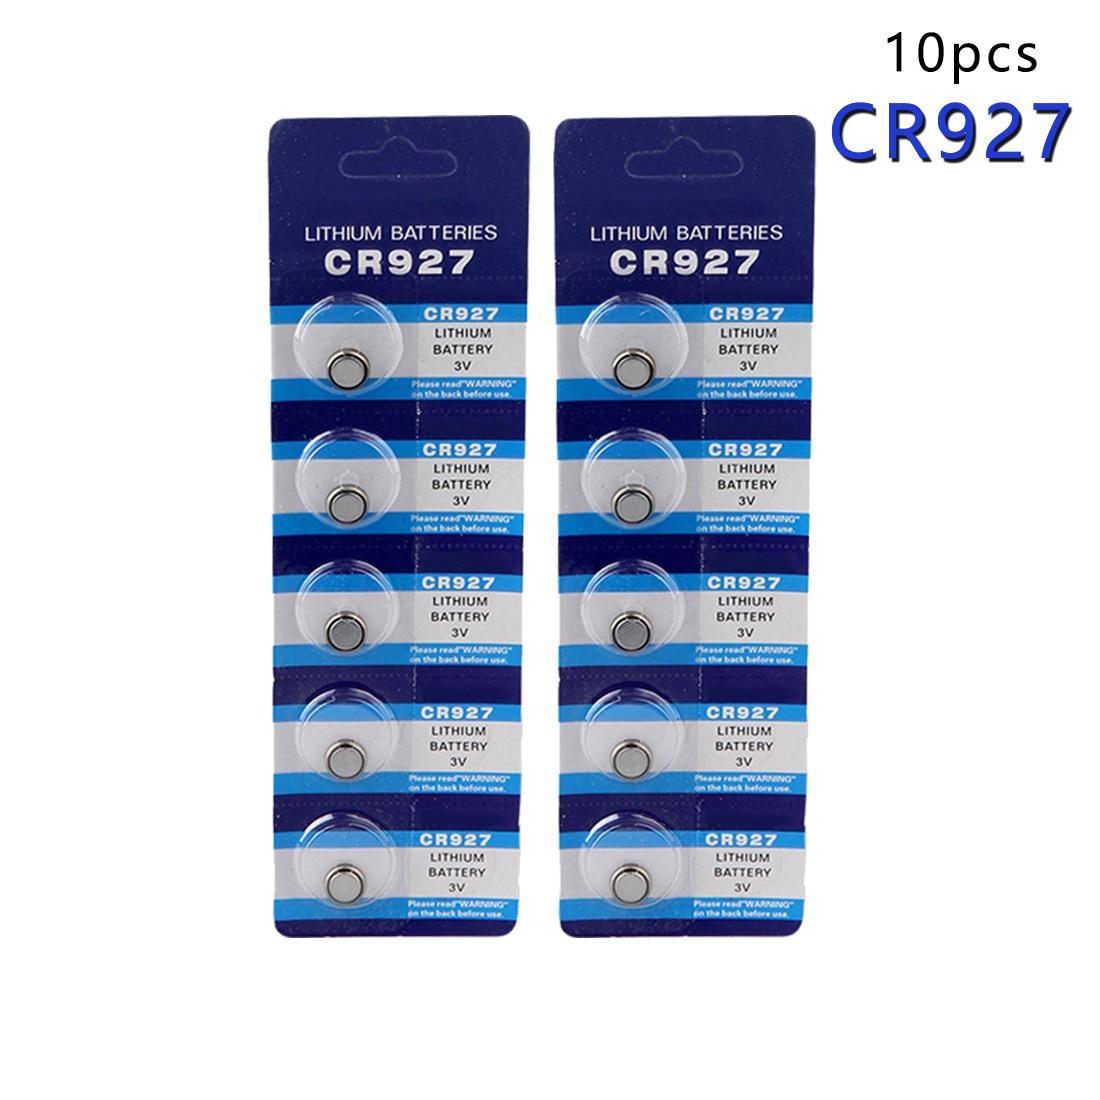 centechia Pro 10 Pcs 3V Lithium Coin Cells Button Battery CR927 DL927 BR927 ECR927 5011LC 927 gd li 1 cr1616 3v 50mah lithium button battery silver 5 pcs